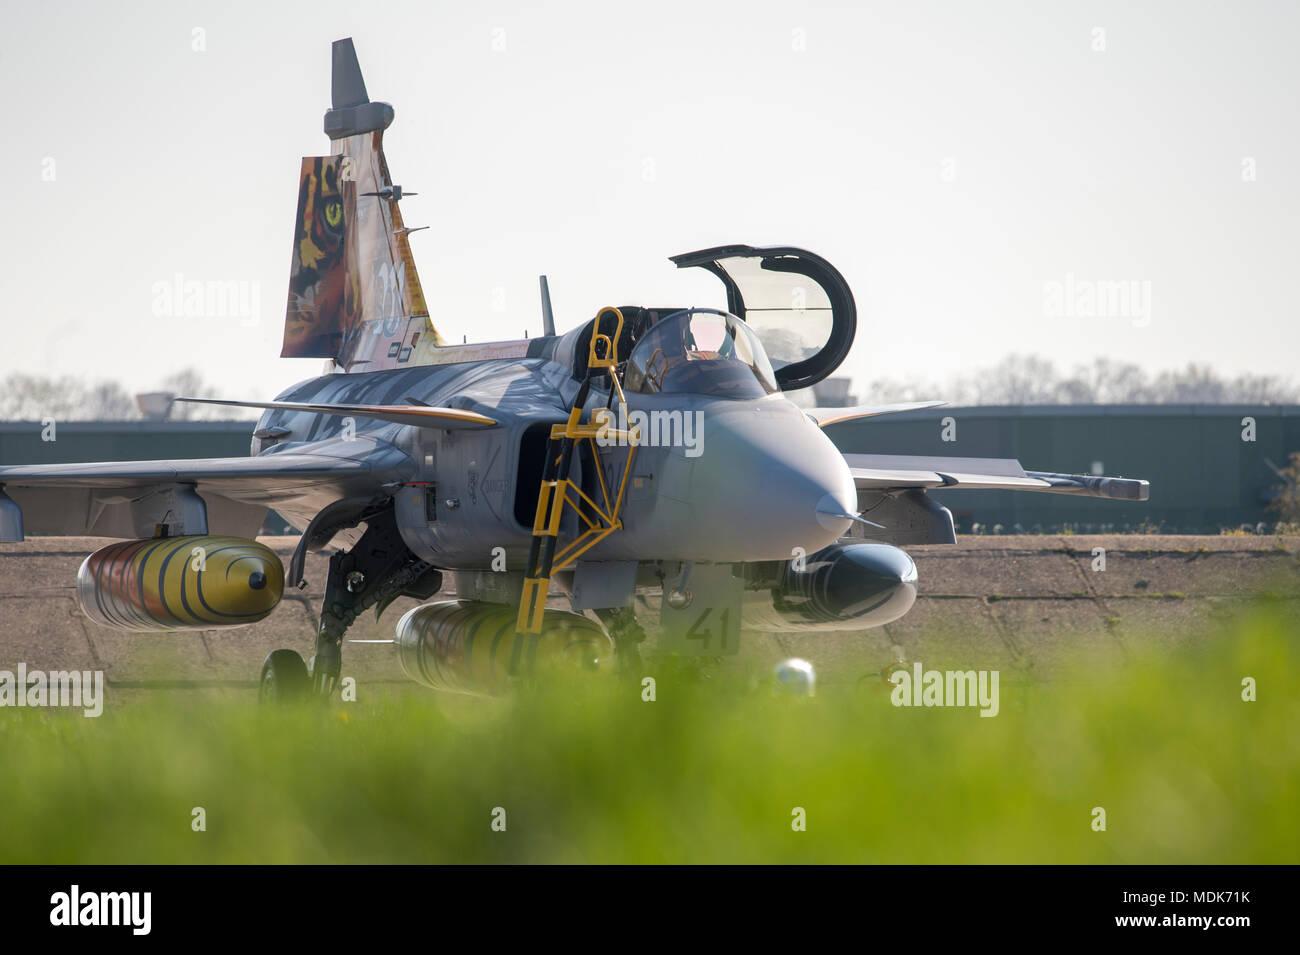 Caslav, Czech Republic  20th Apr, 2018  Five fighter